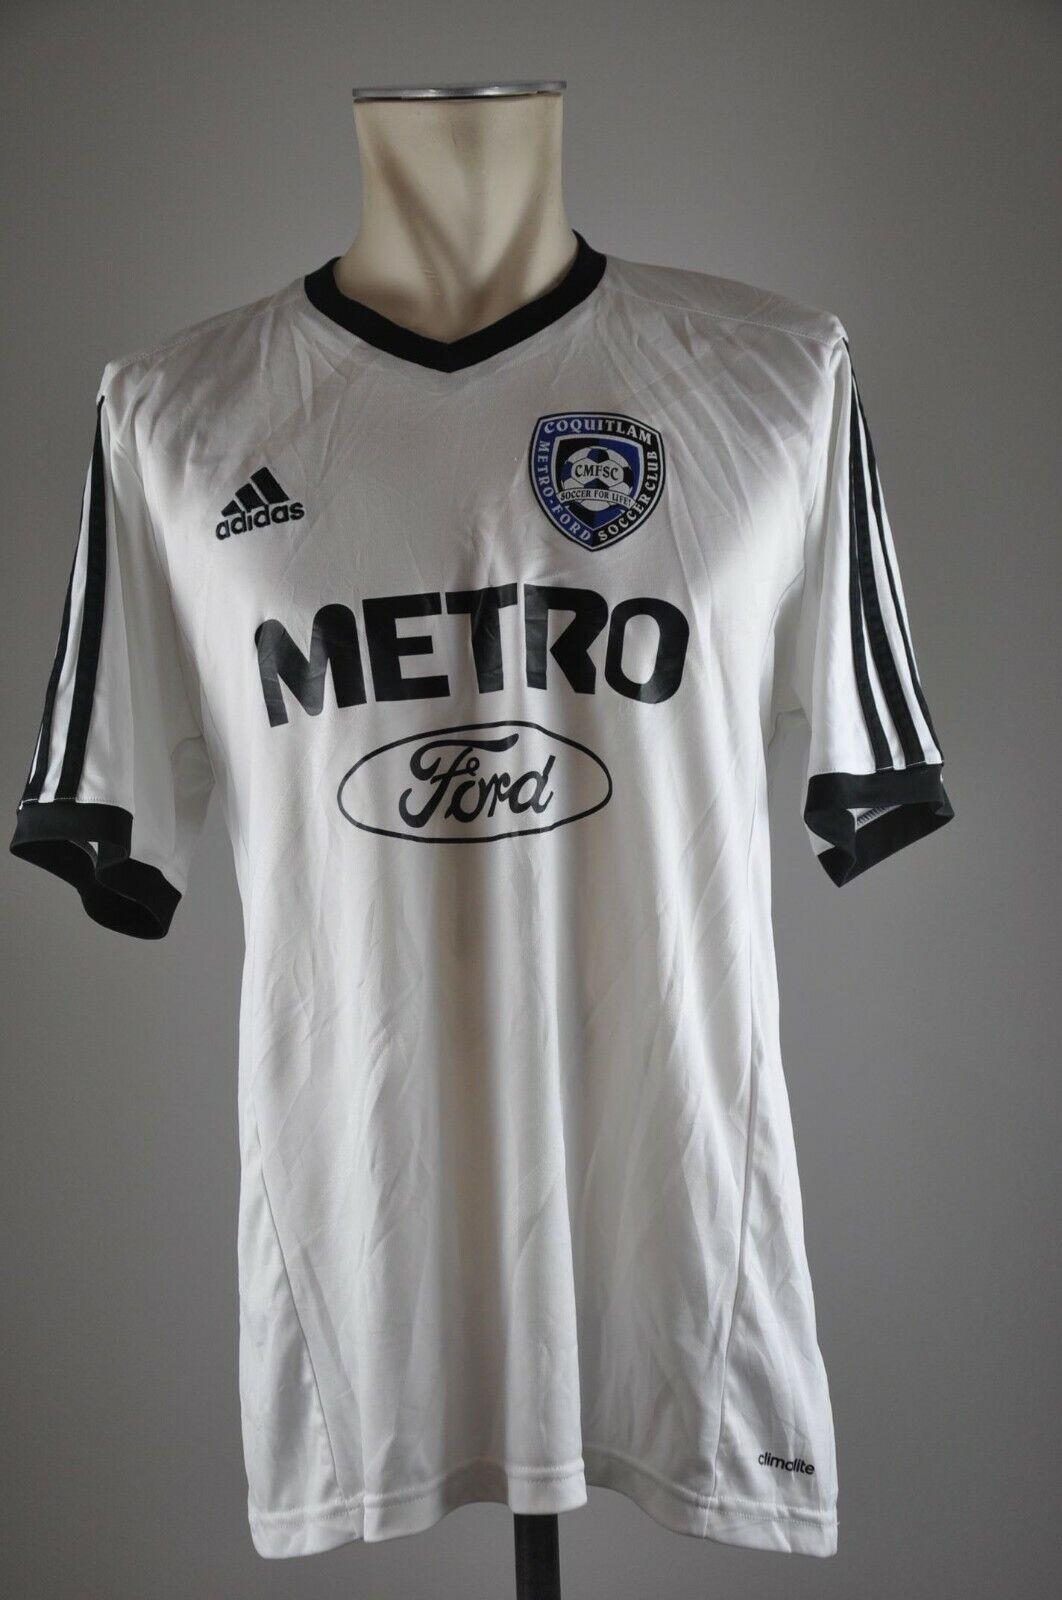 Coquitlam Metro-Ford Soccer Club Trikot Gr. L  30 30 30 2015-2016 USA Shirt Jersey cb2d46